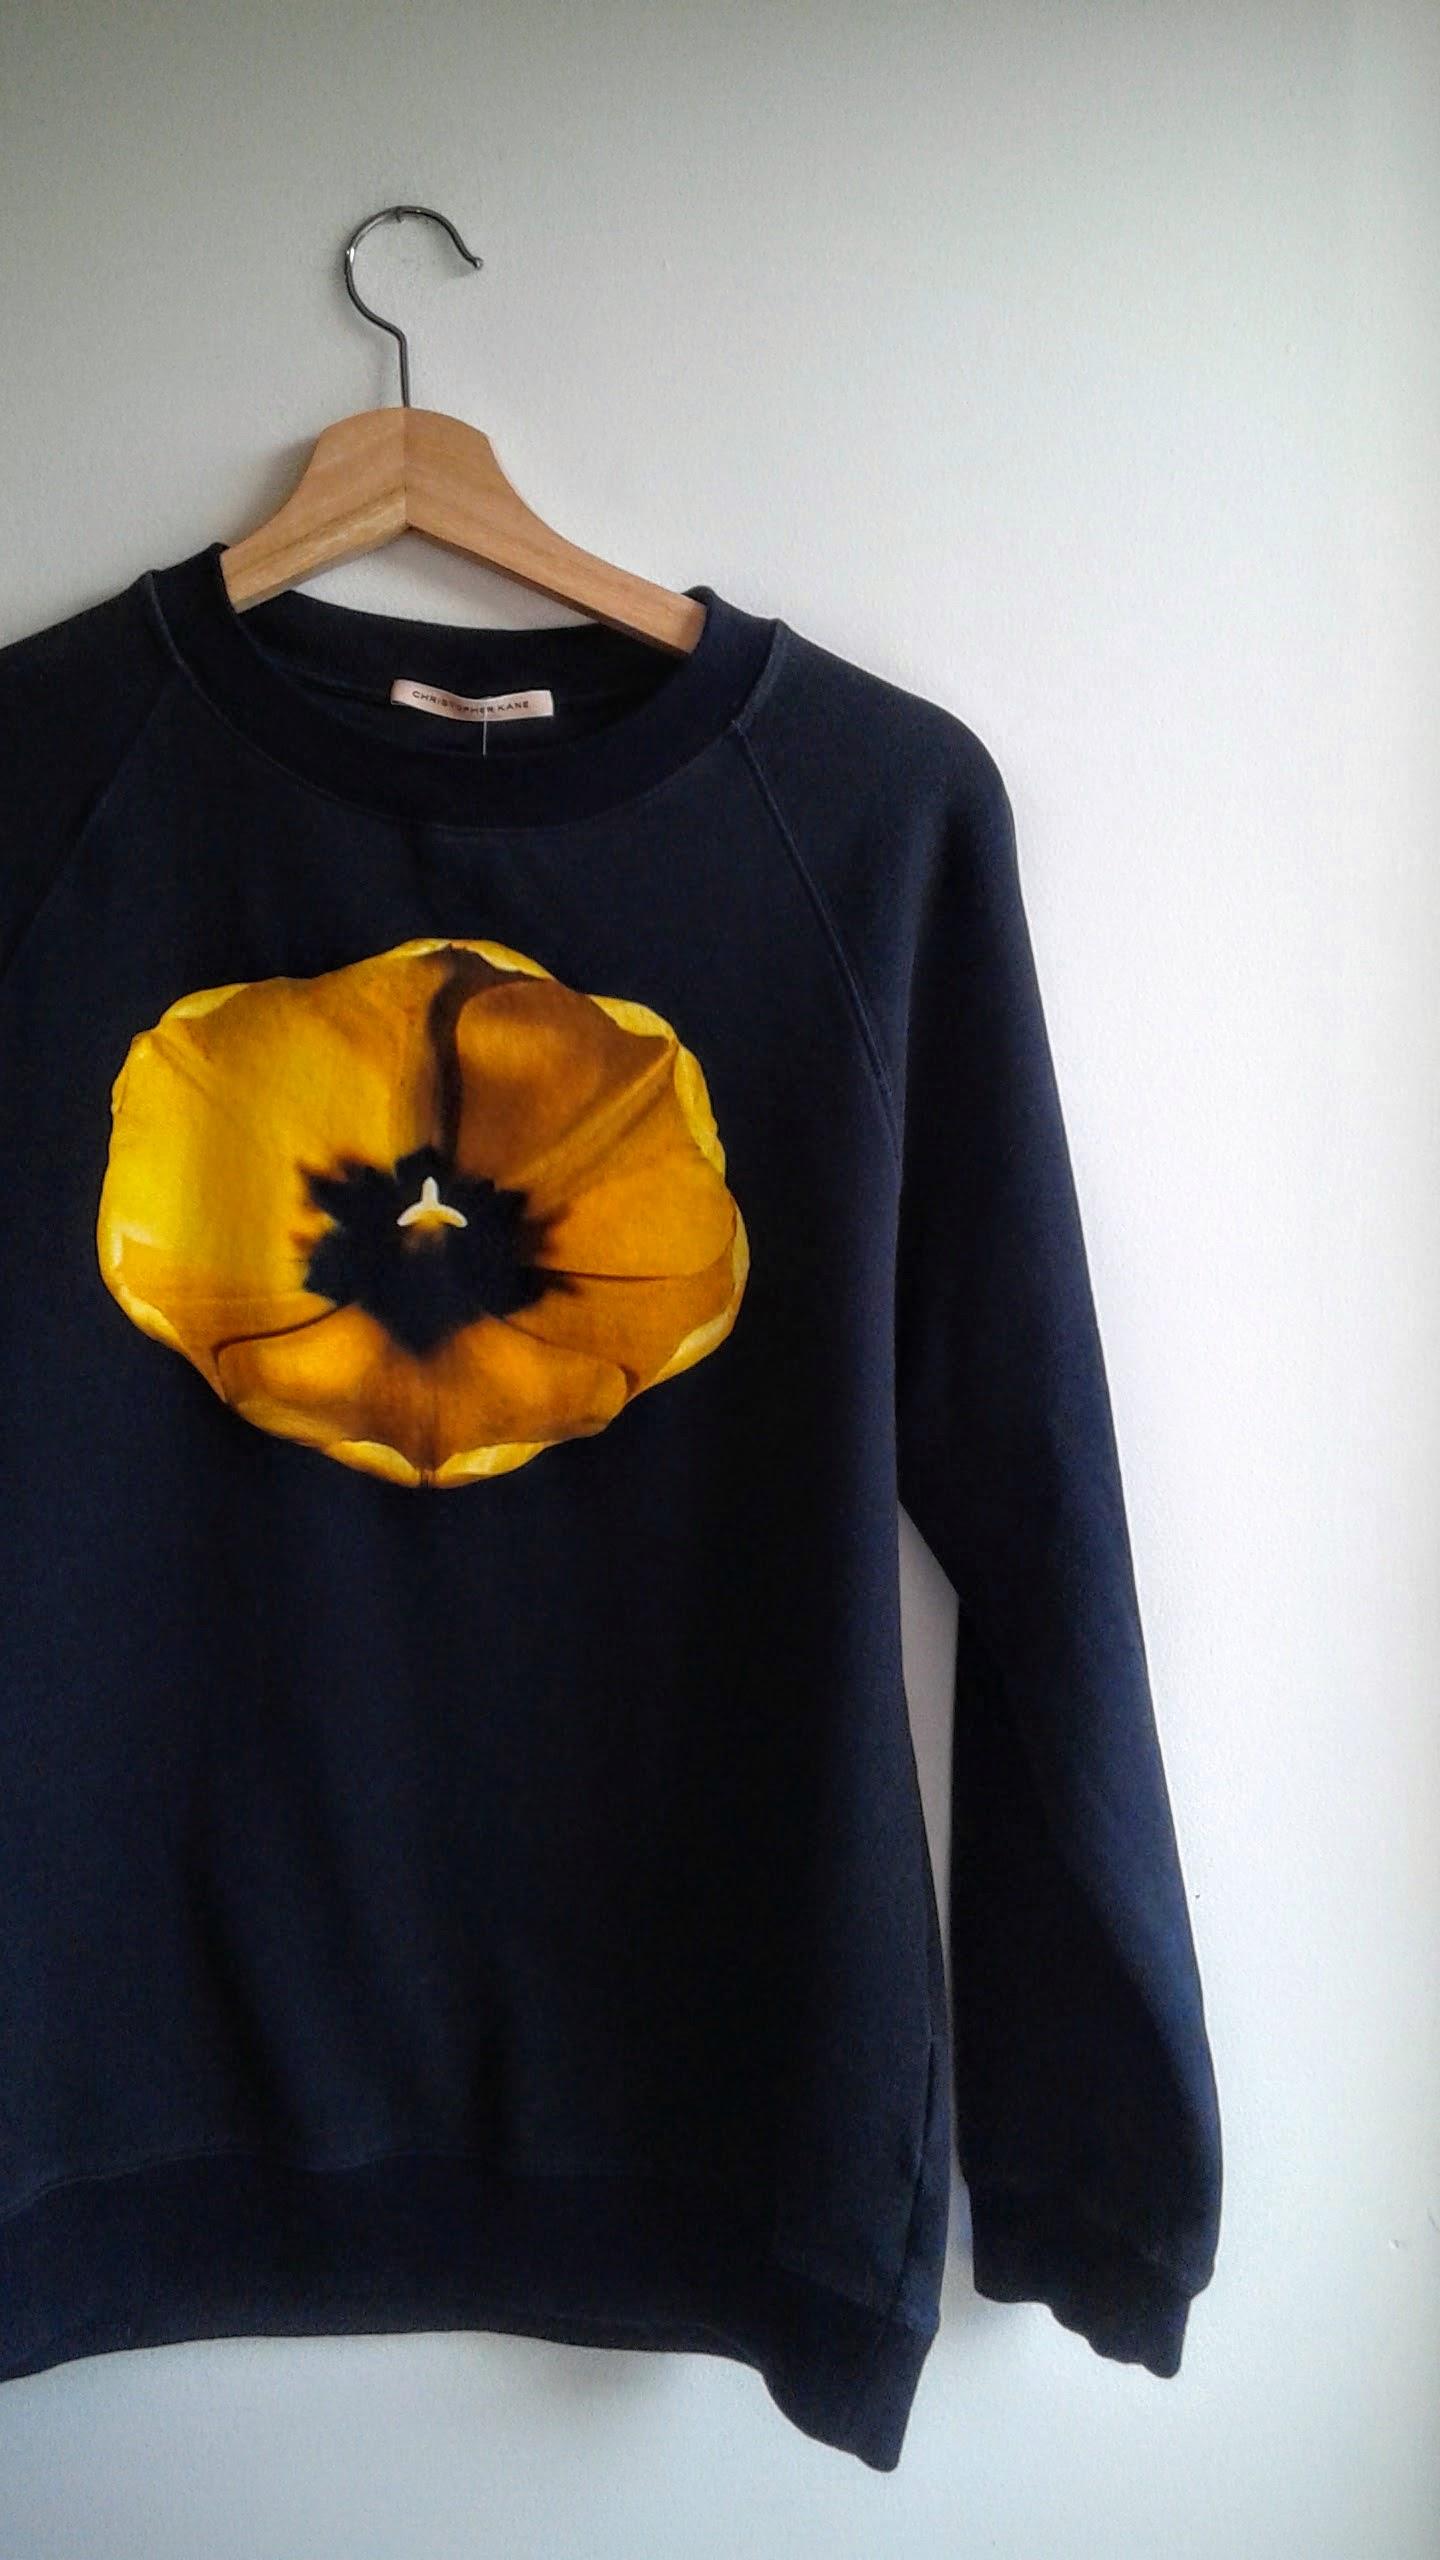 Christopher Kane sweatshirt; Size S, $60